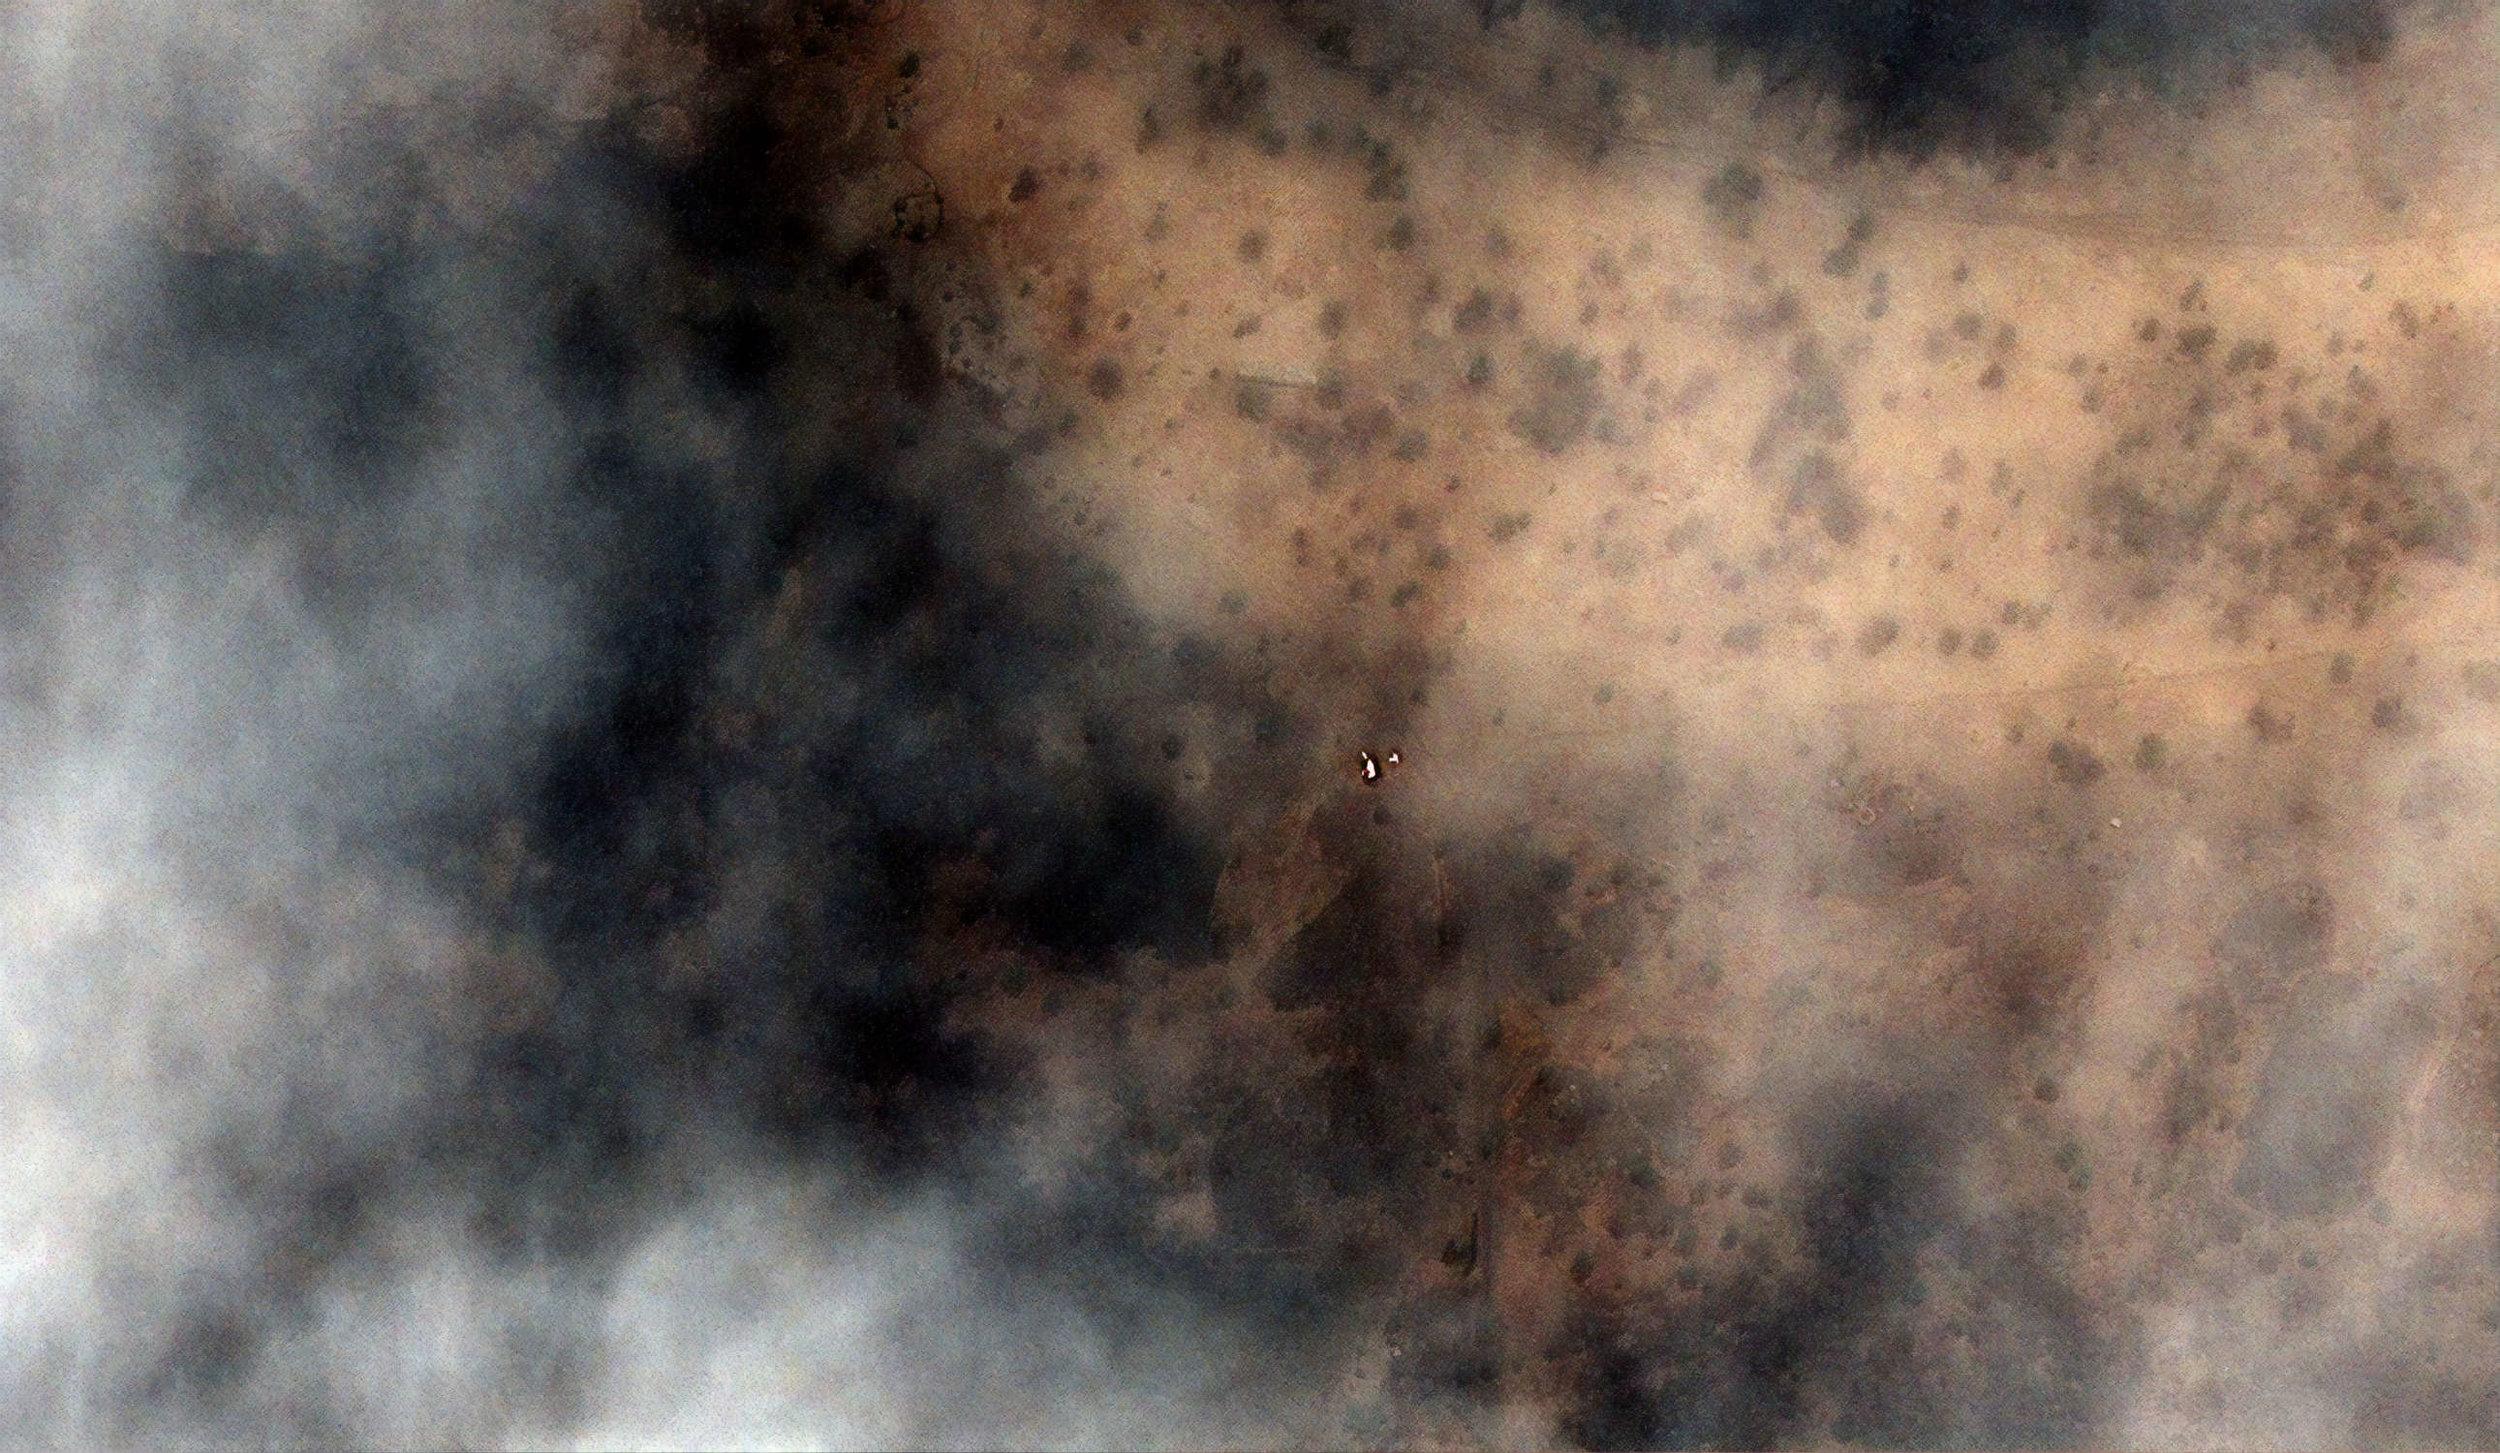 Fire burning near Abyei town . May 24, 2011. Image credit: DigitalGlobe.